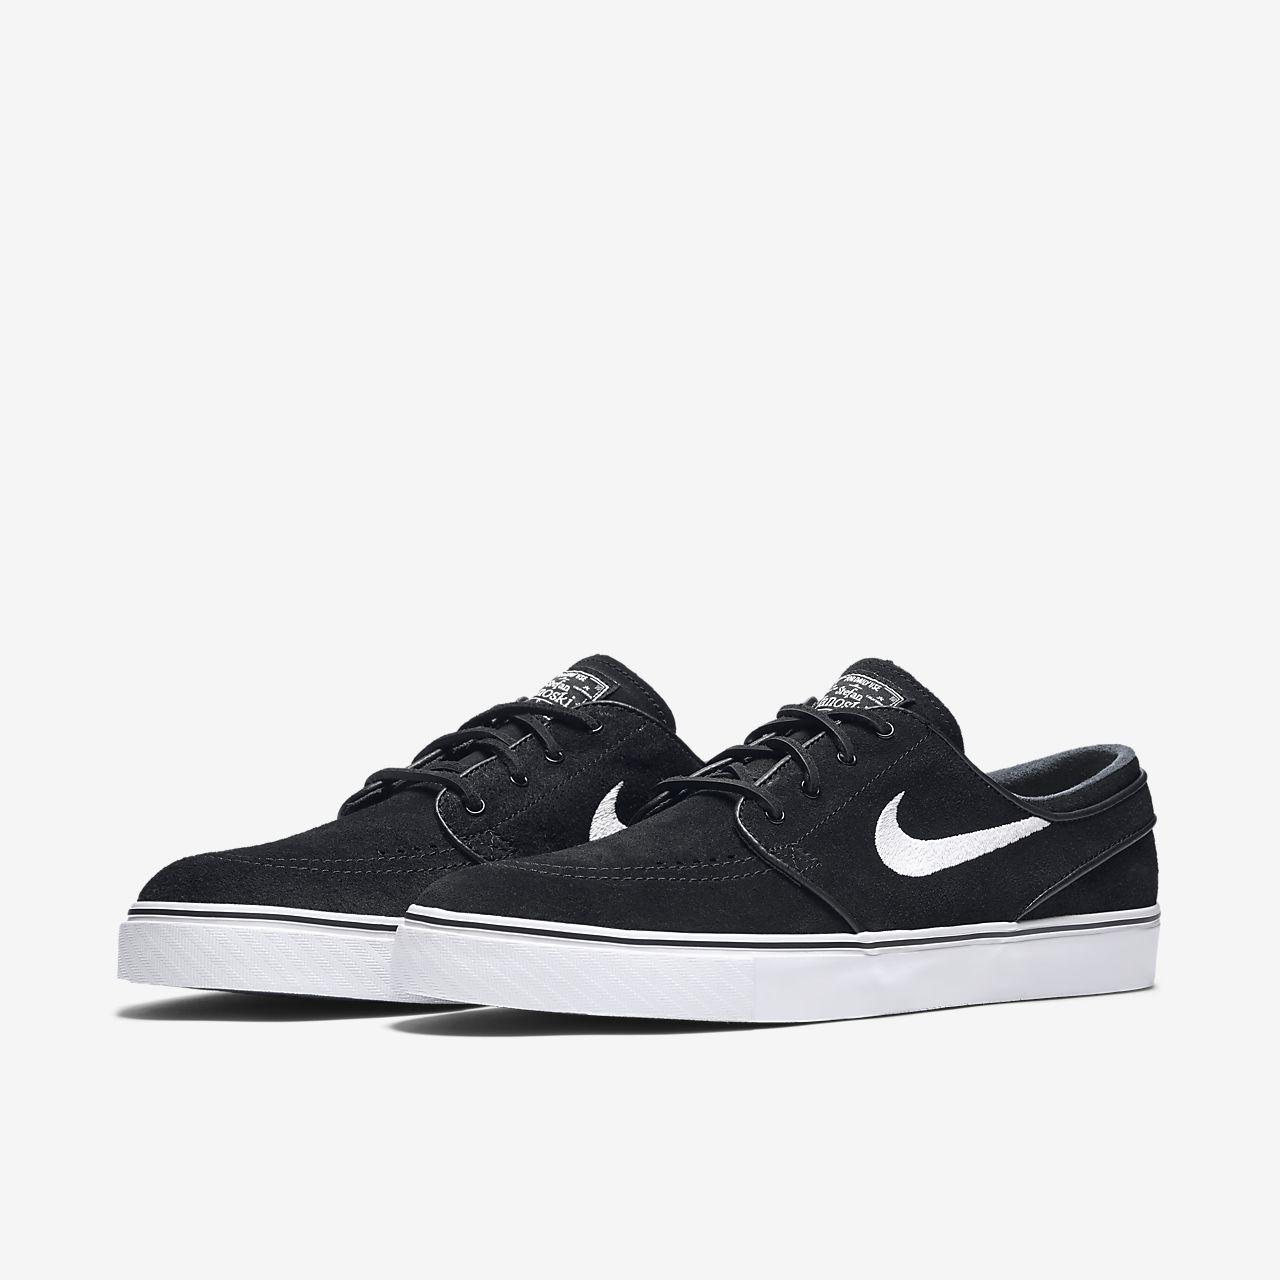 9881e2c14272 Nike SB Zoom Stefan Janoski OG Men s Skate Shoe. Nike.com AU